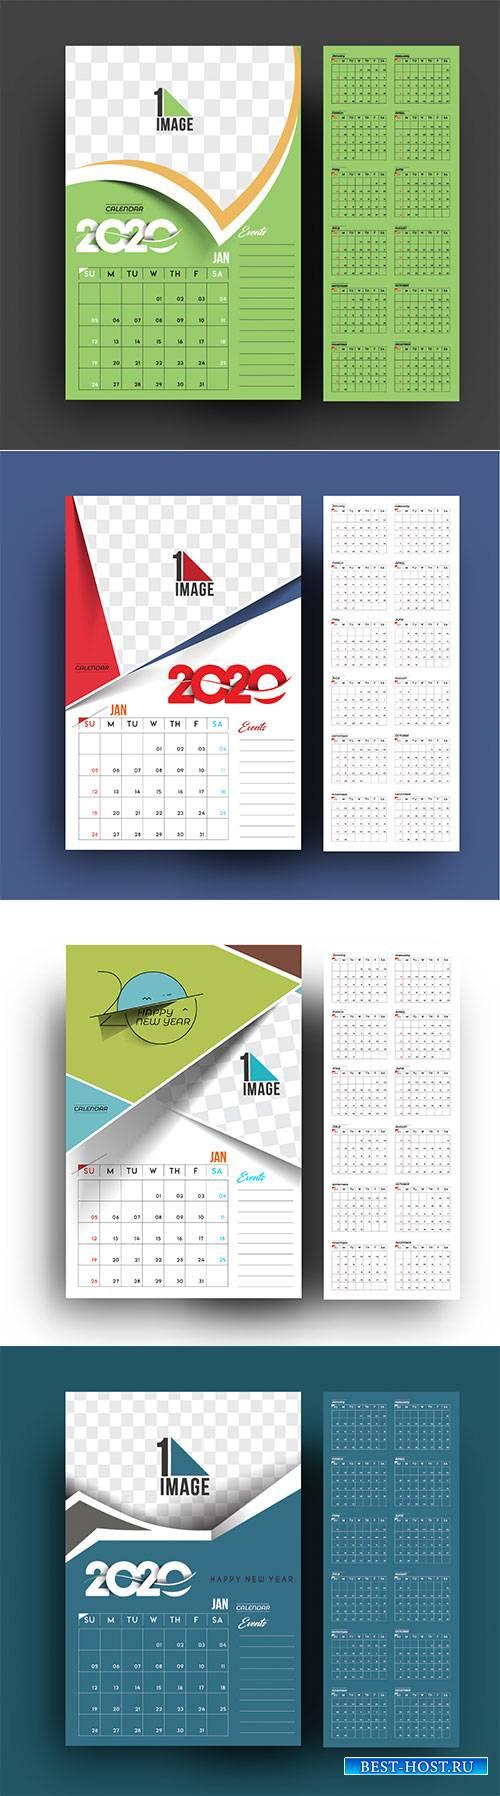 Happy new year 2020 Calendar # 3